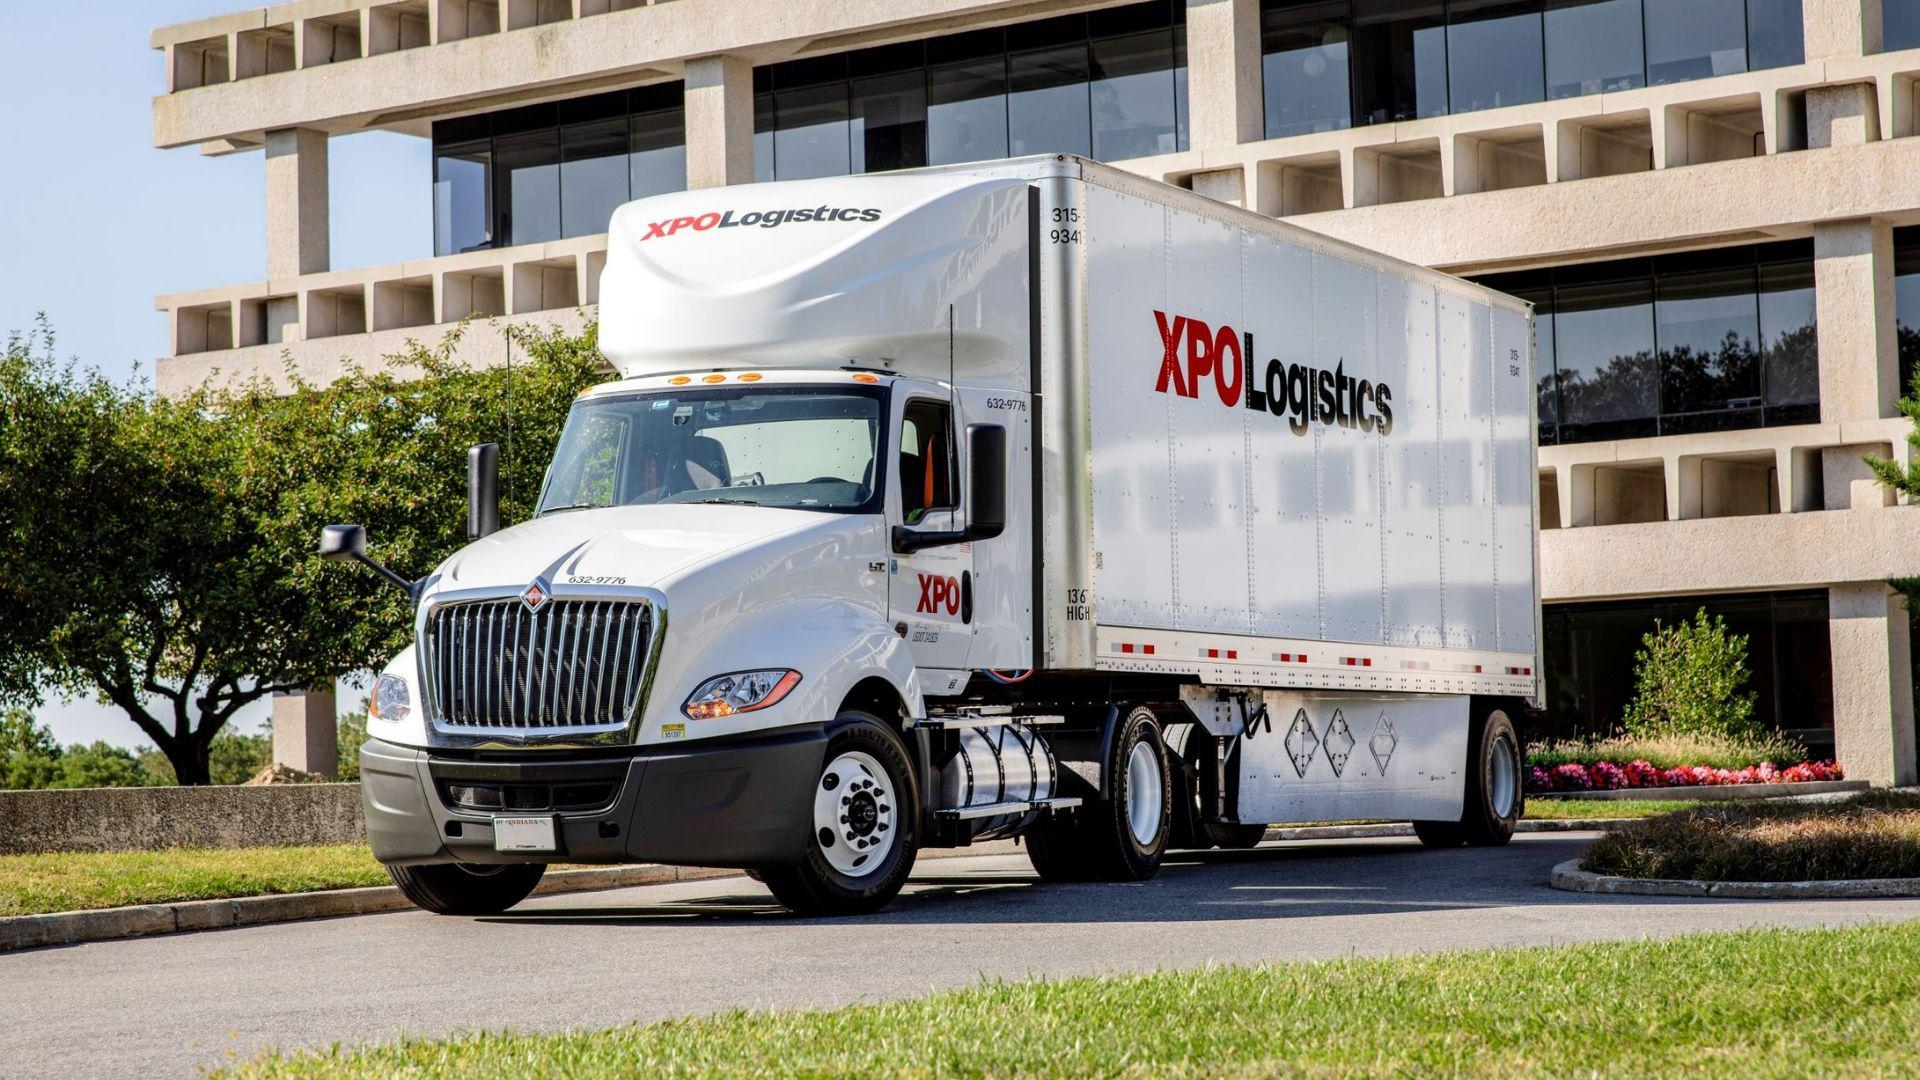 XPO Logistics American truck